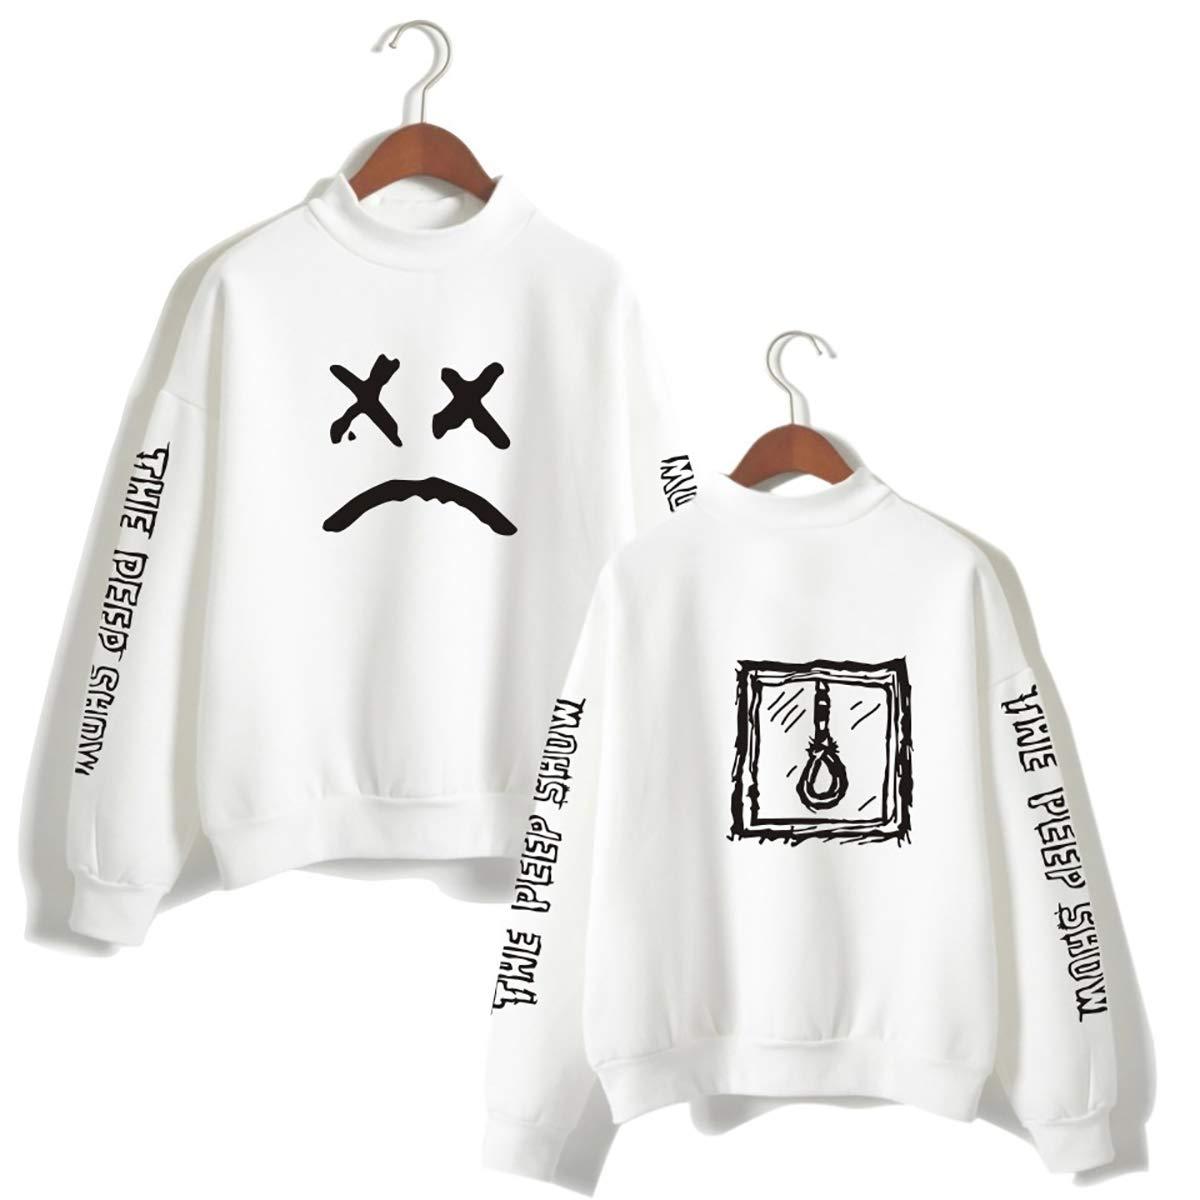 Unisex Sweatshirt, Autumn Warm Music Style Pullover Fashion Printed Baseball Uniform,Weiß1,XXL